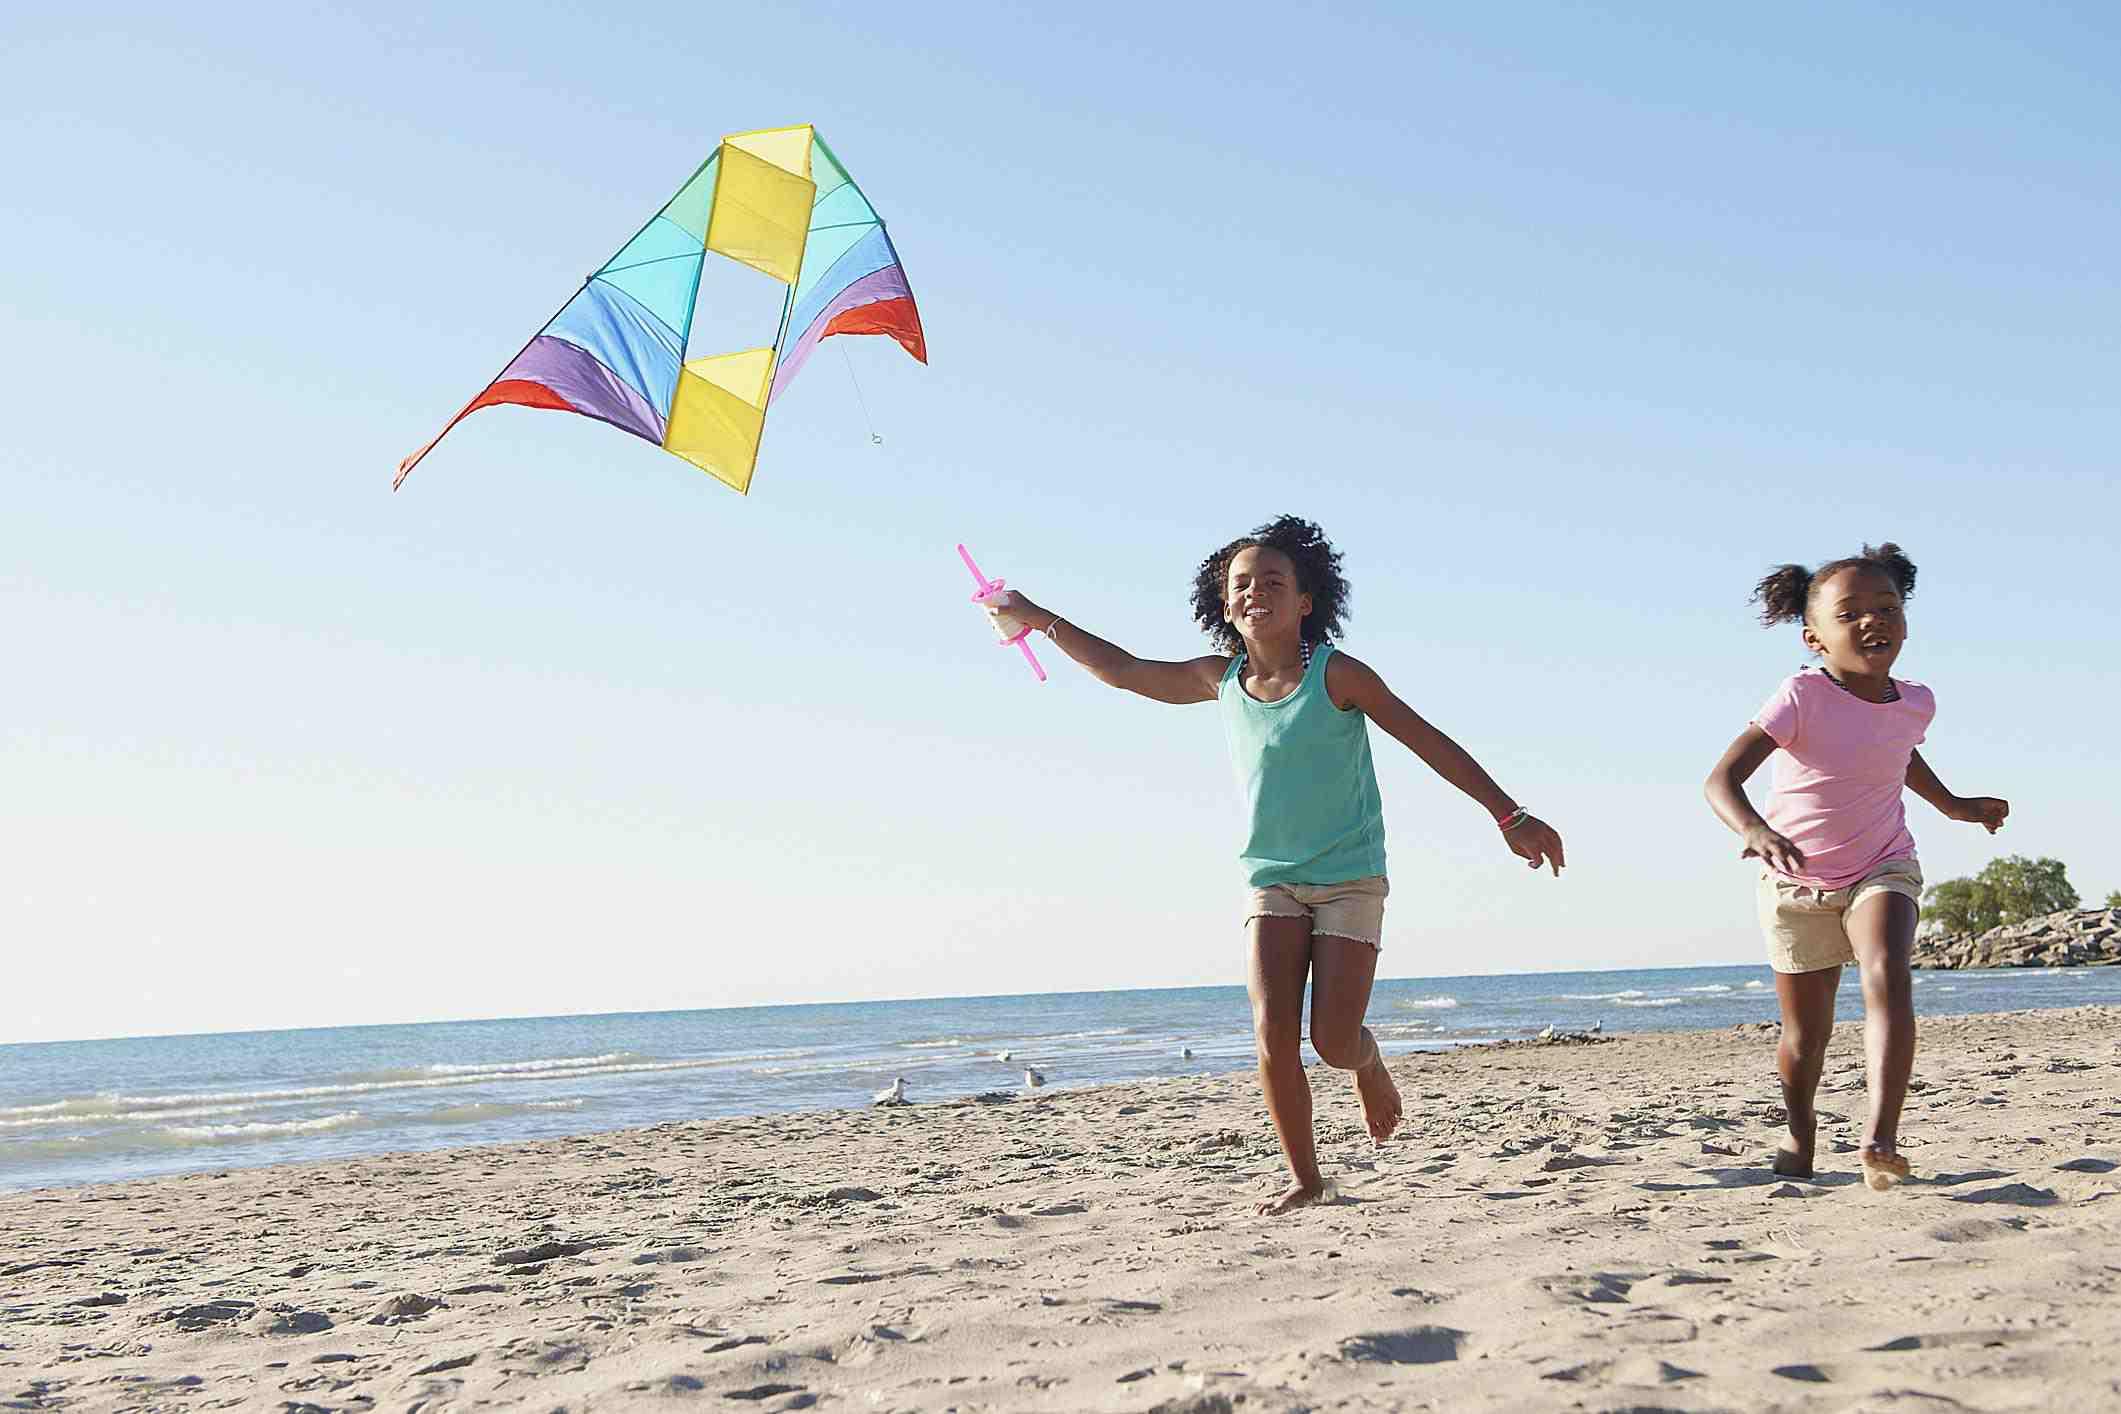 Girls flying kites on beach